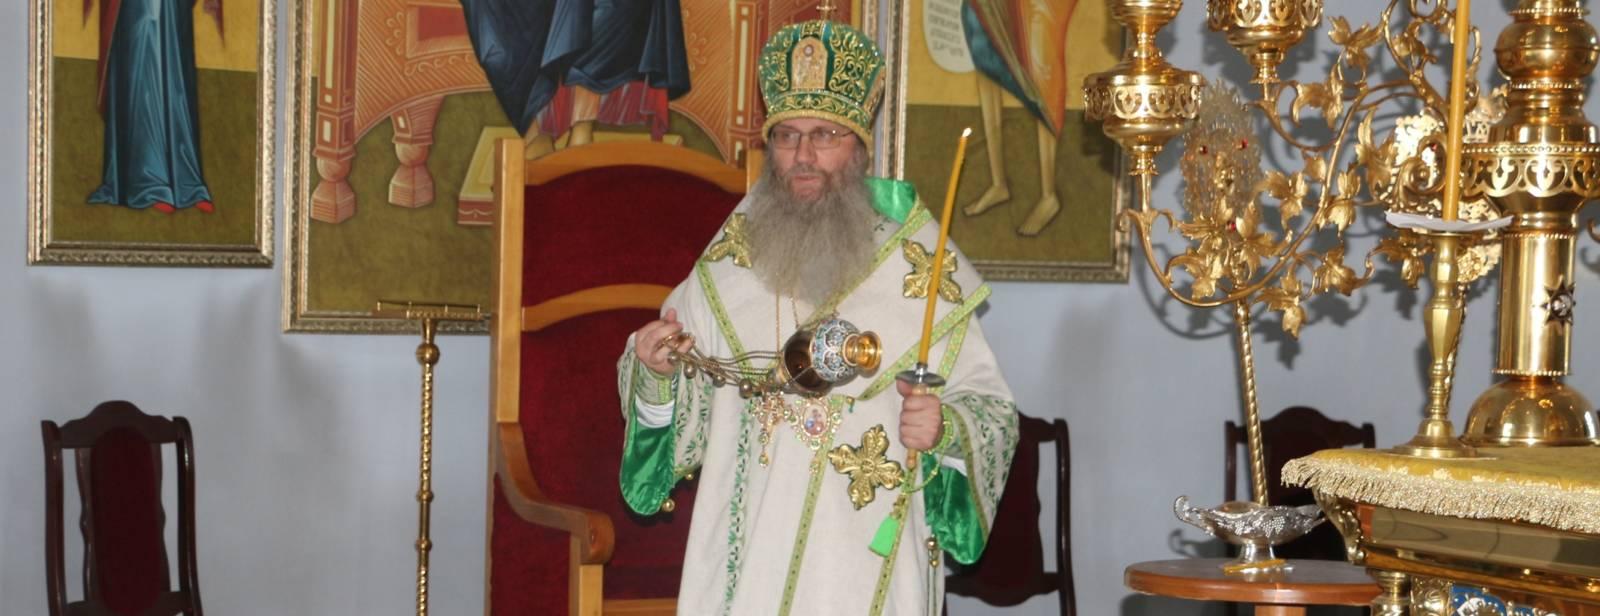 В канун Дня памяти Обретение мощей прп. Серафима, Саровского чудотворца.